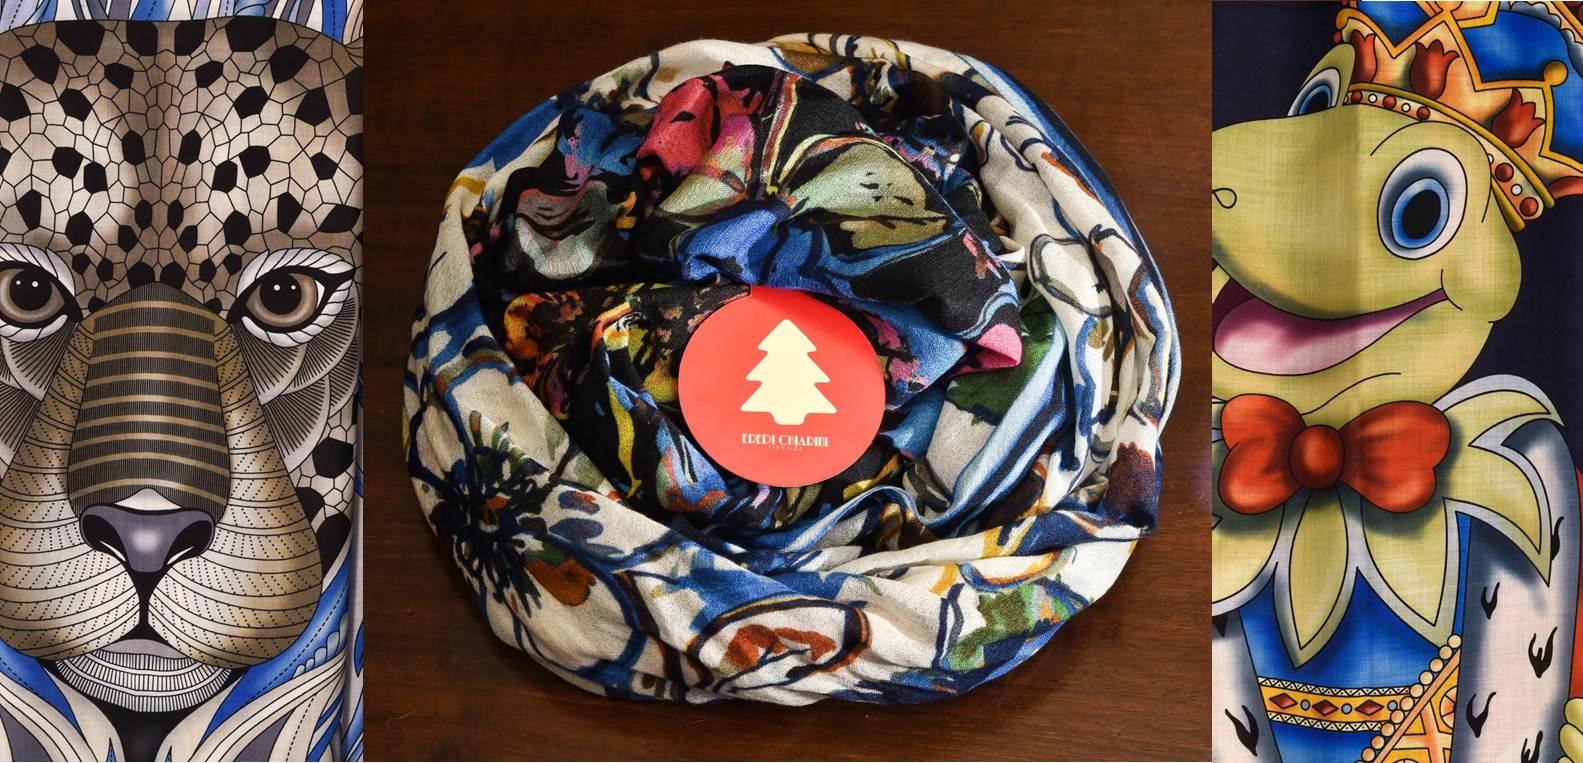 Regali di Natale per lui - sciarpe opere d'arte cachemire seta fantasia